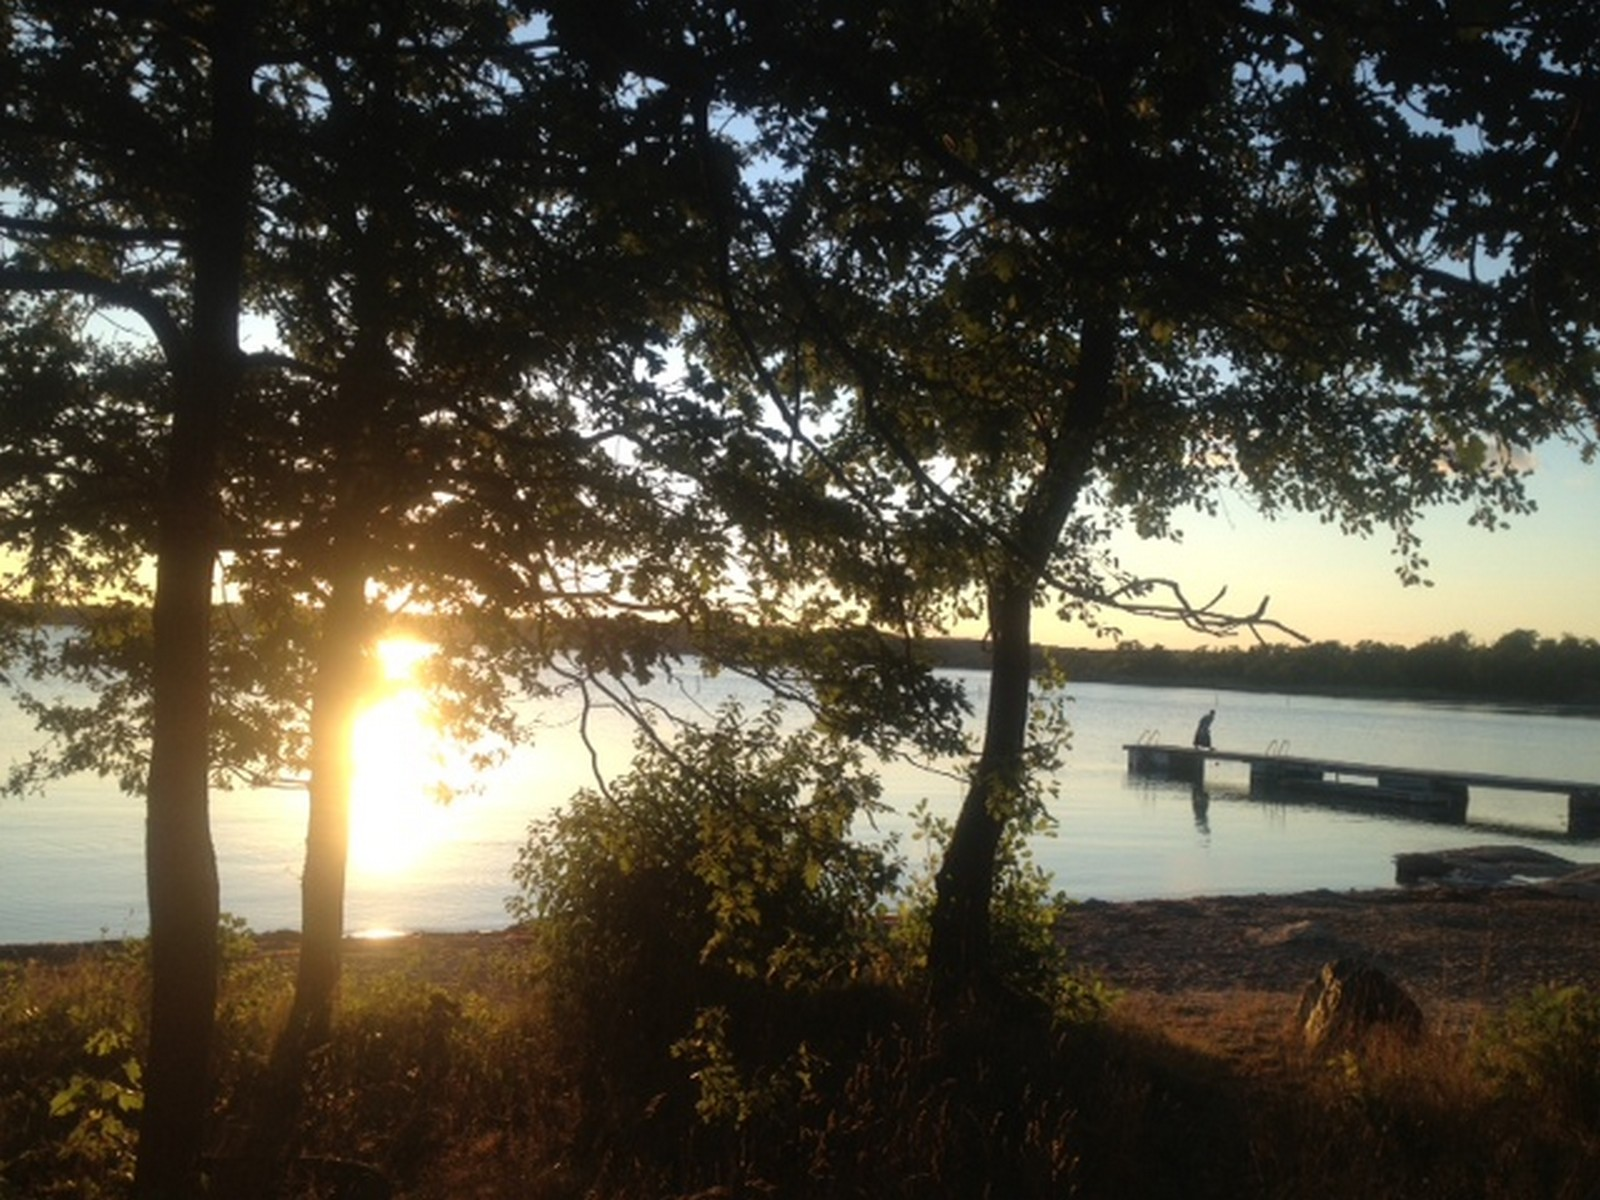 Bidrag 3 - Solnedgång vid Studentviken